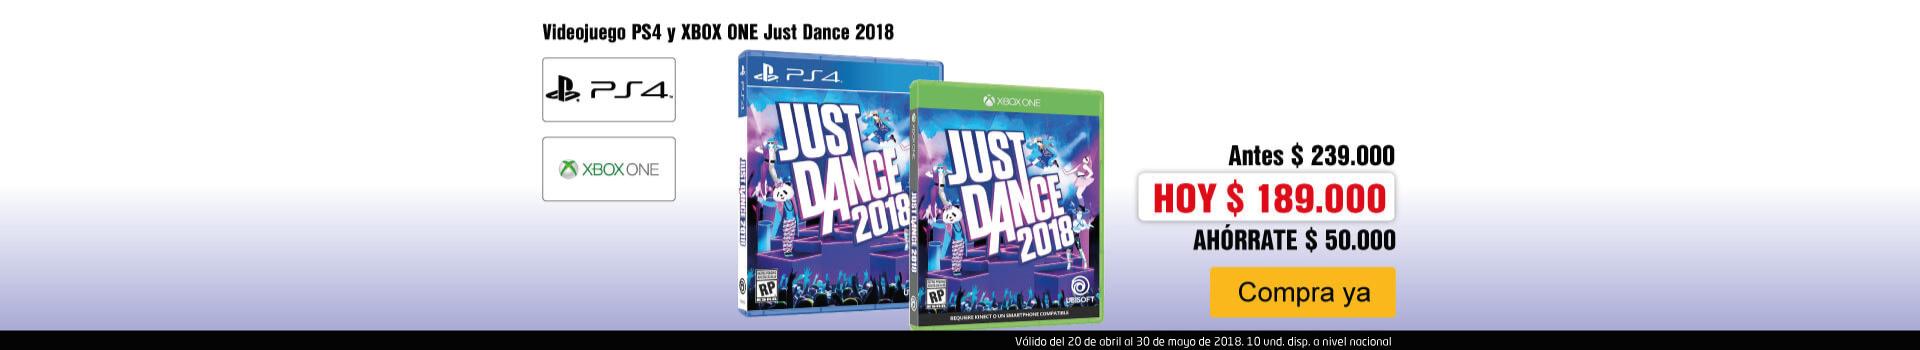 AK-KT-BCAT-9-videojuegos-PP---Ps4-Xbox-justdance2018-Abr25